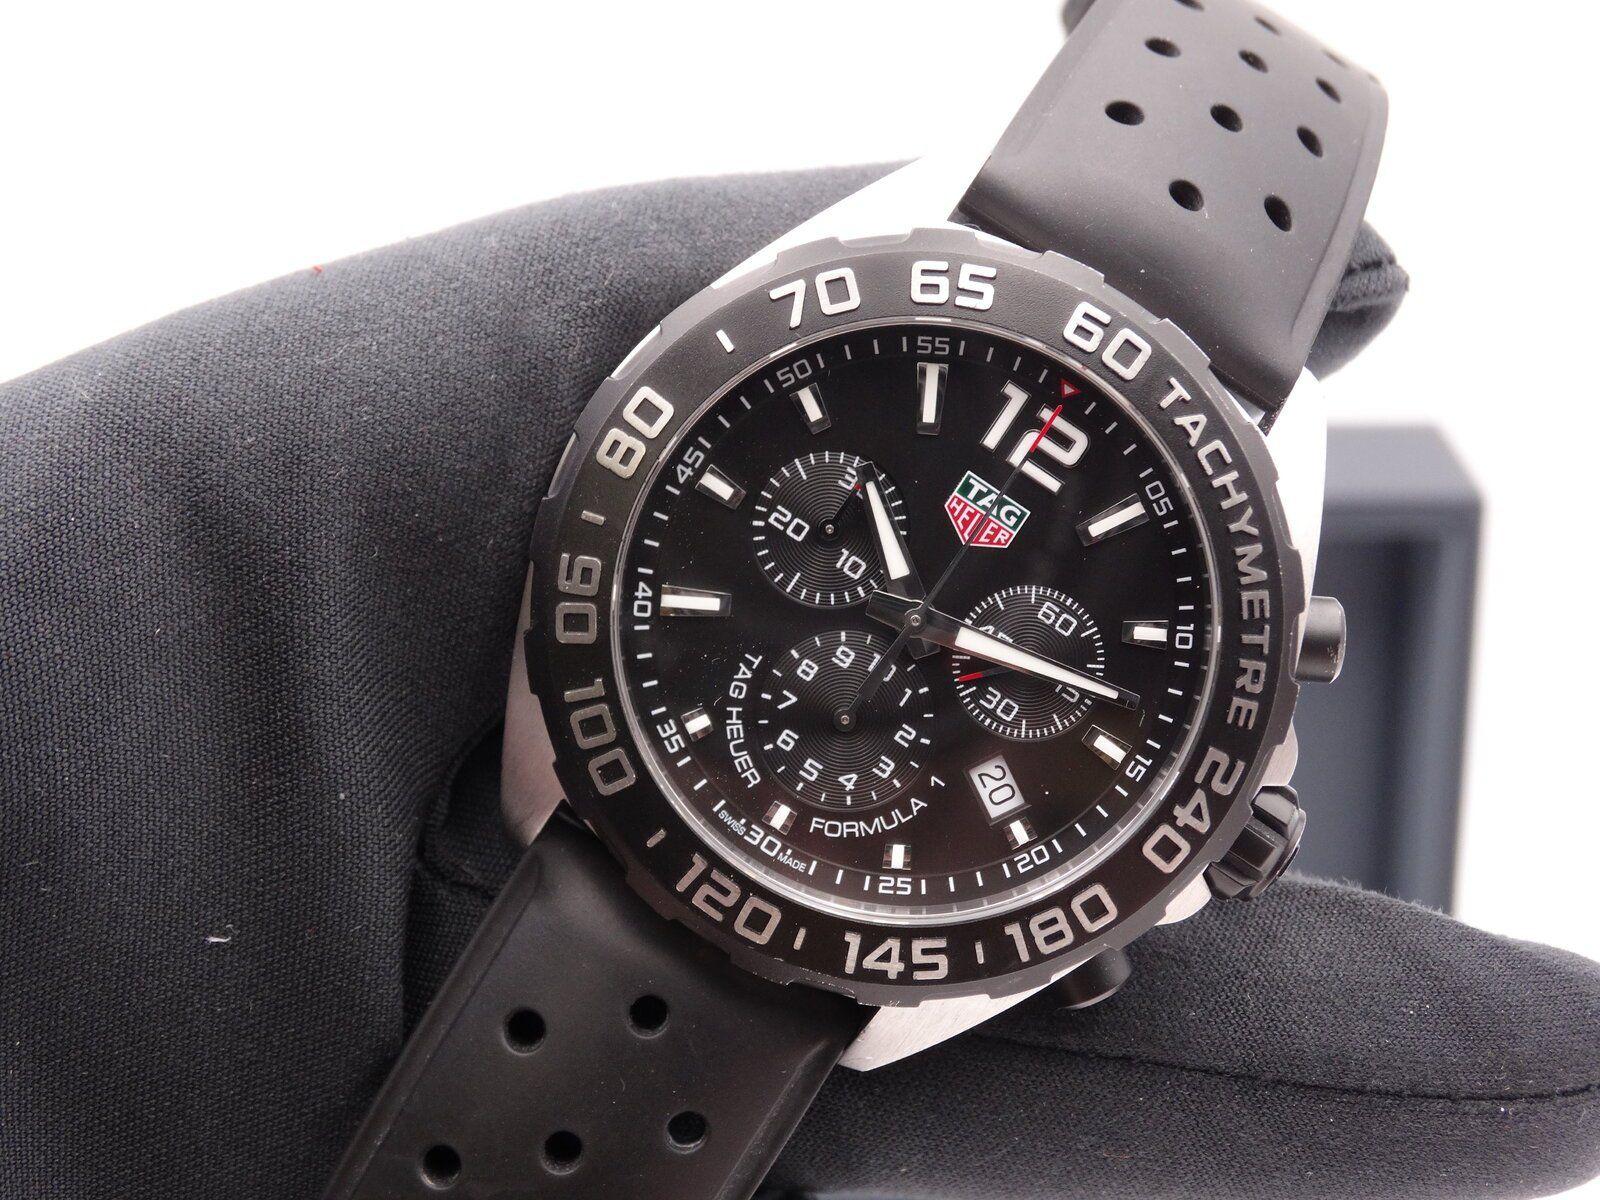 Tag Heuer Formula 1 Chronograph 01350.JPG